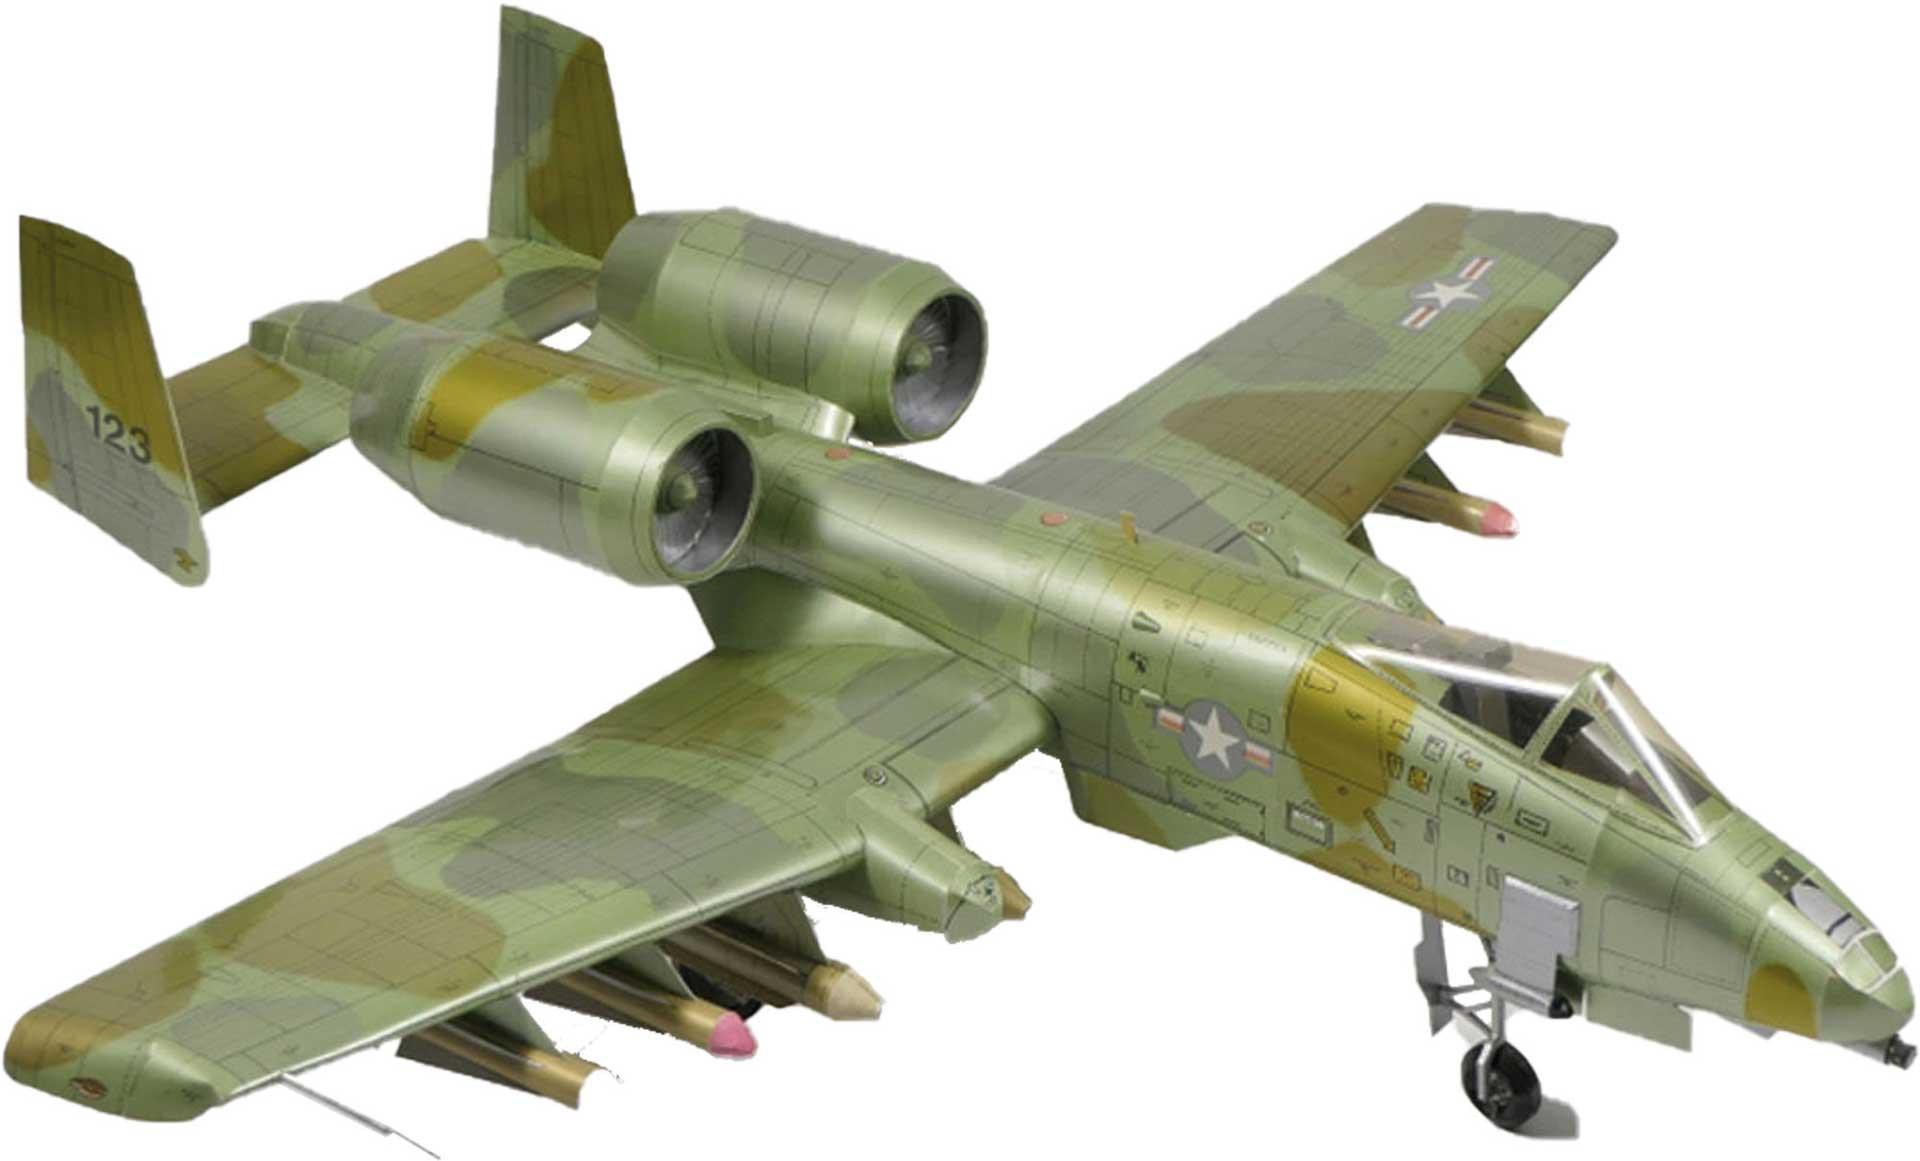 GELI FAIRCHILD A-10 KARTONMODELL